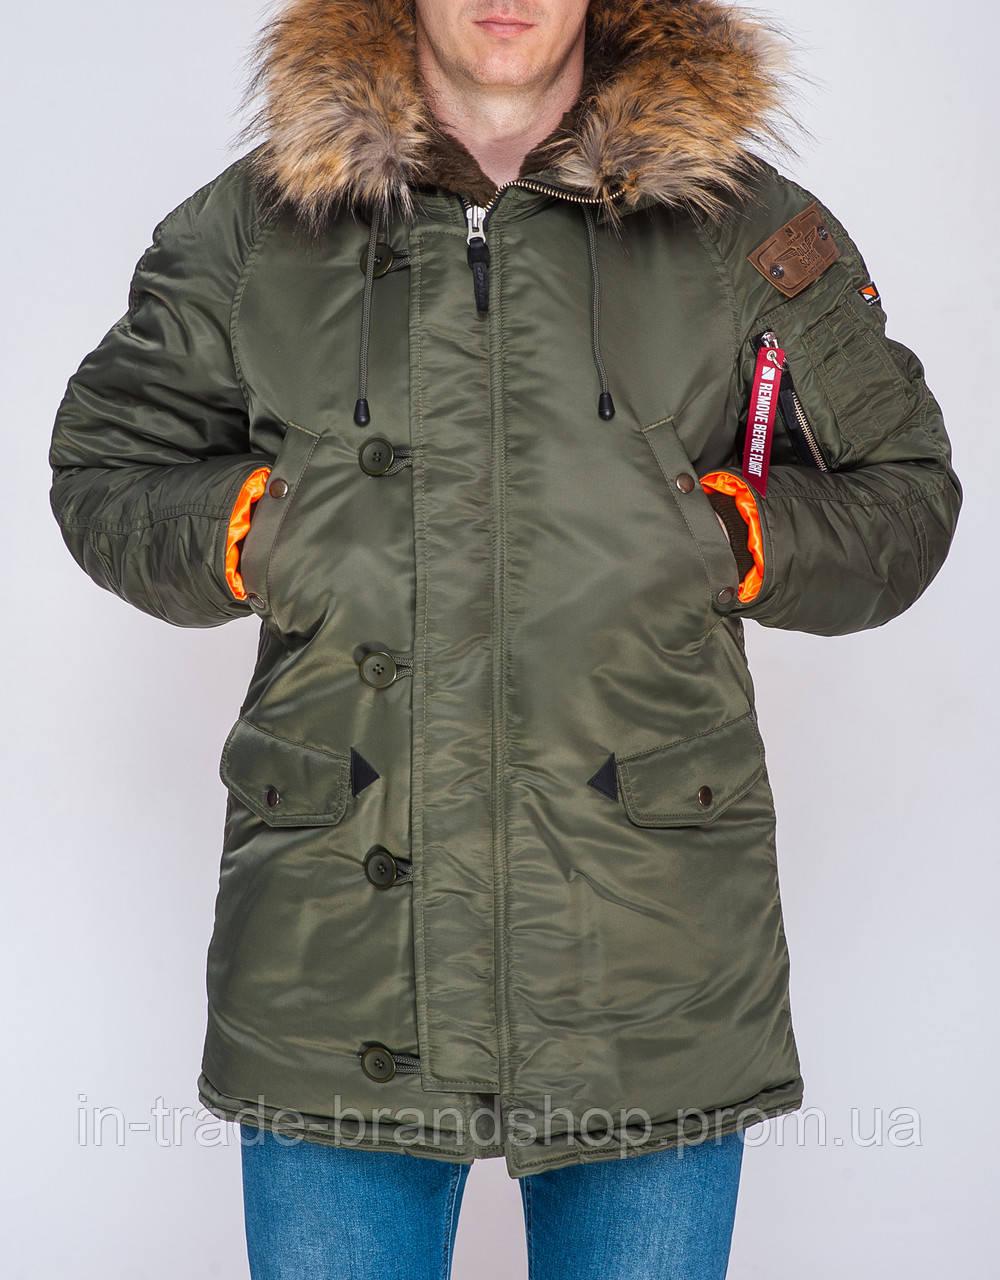 Парка Olymp — Аляска N-3B Old School, Slim Fit, Color: Khaki. 100% НЕЙЛОН